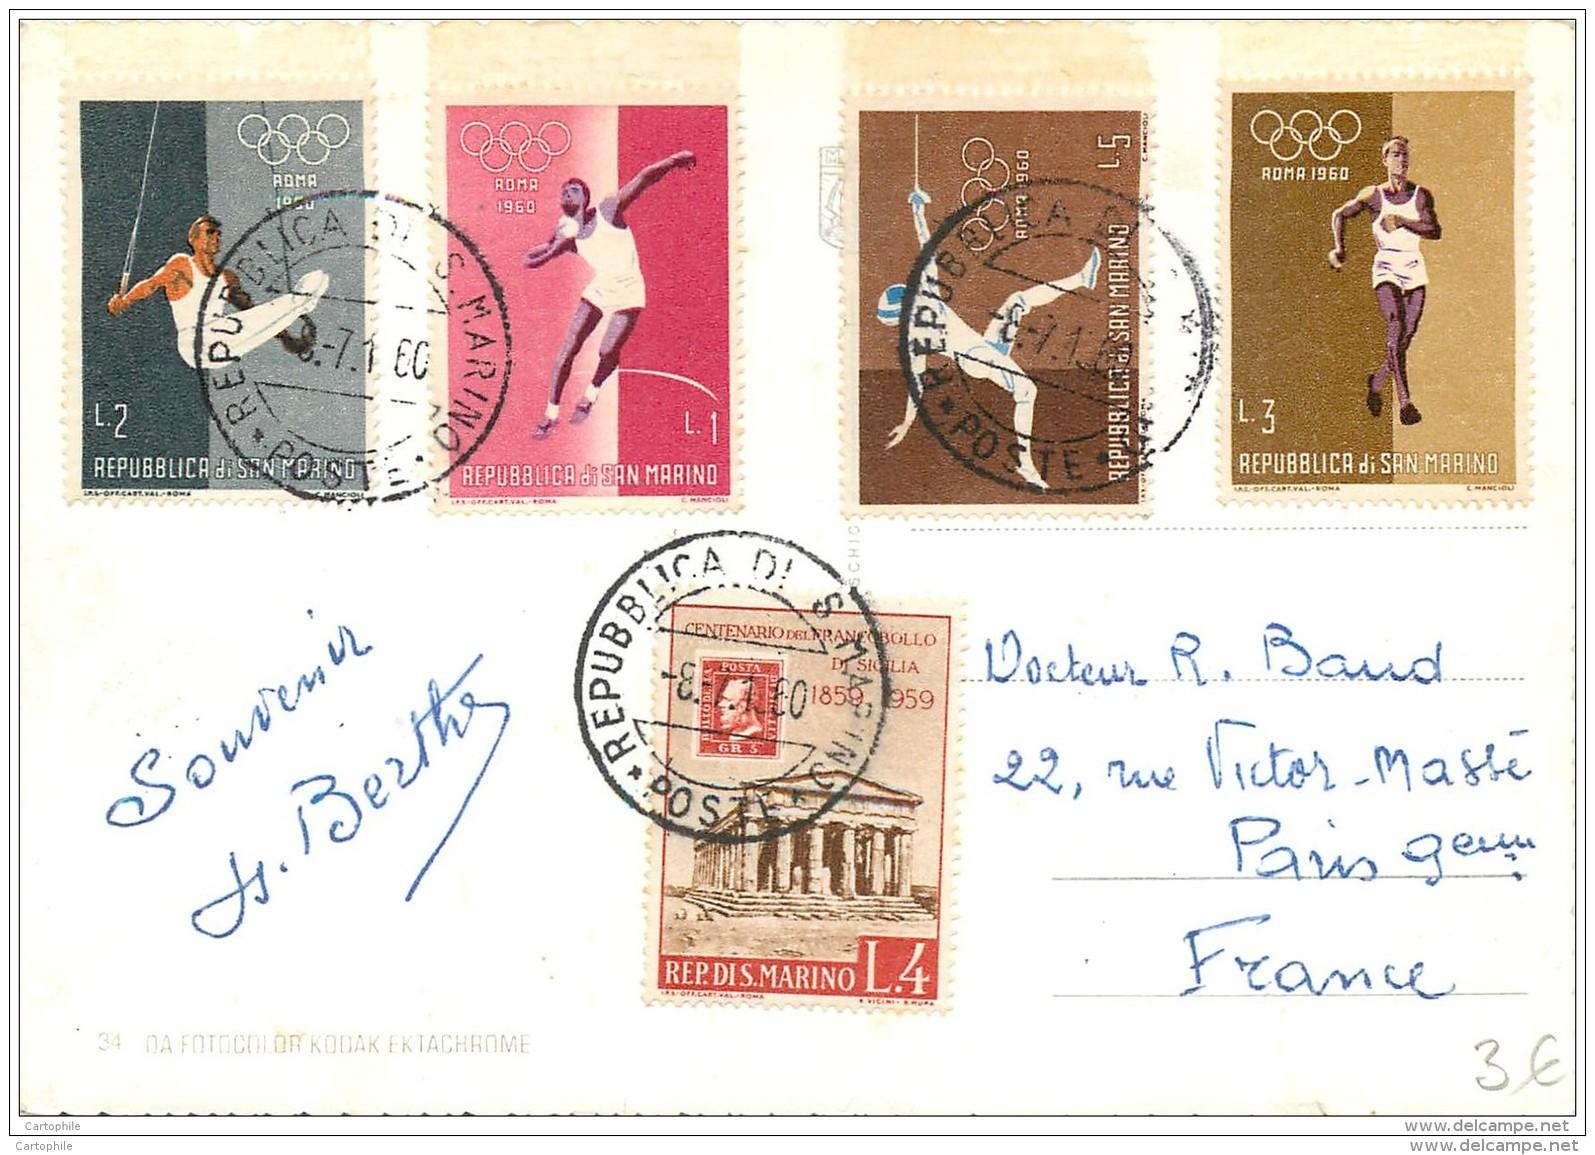 San Marino - Beautiful Stamps On Postcard 1960 - Olympic Games Roma 1960 JO - San Marino